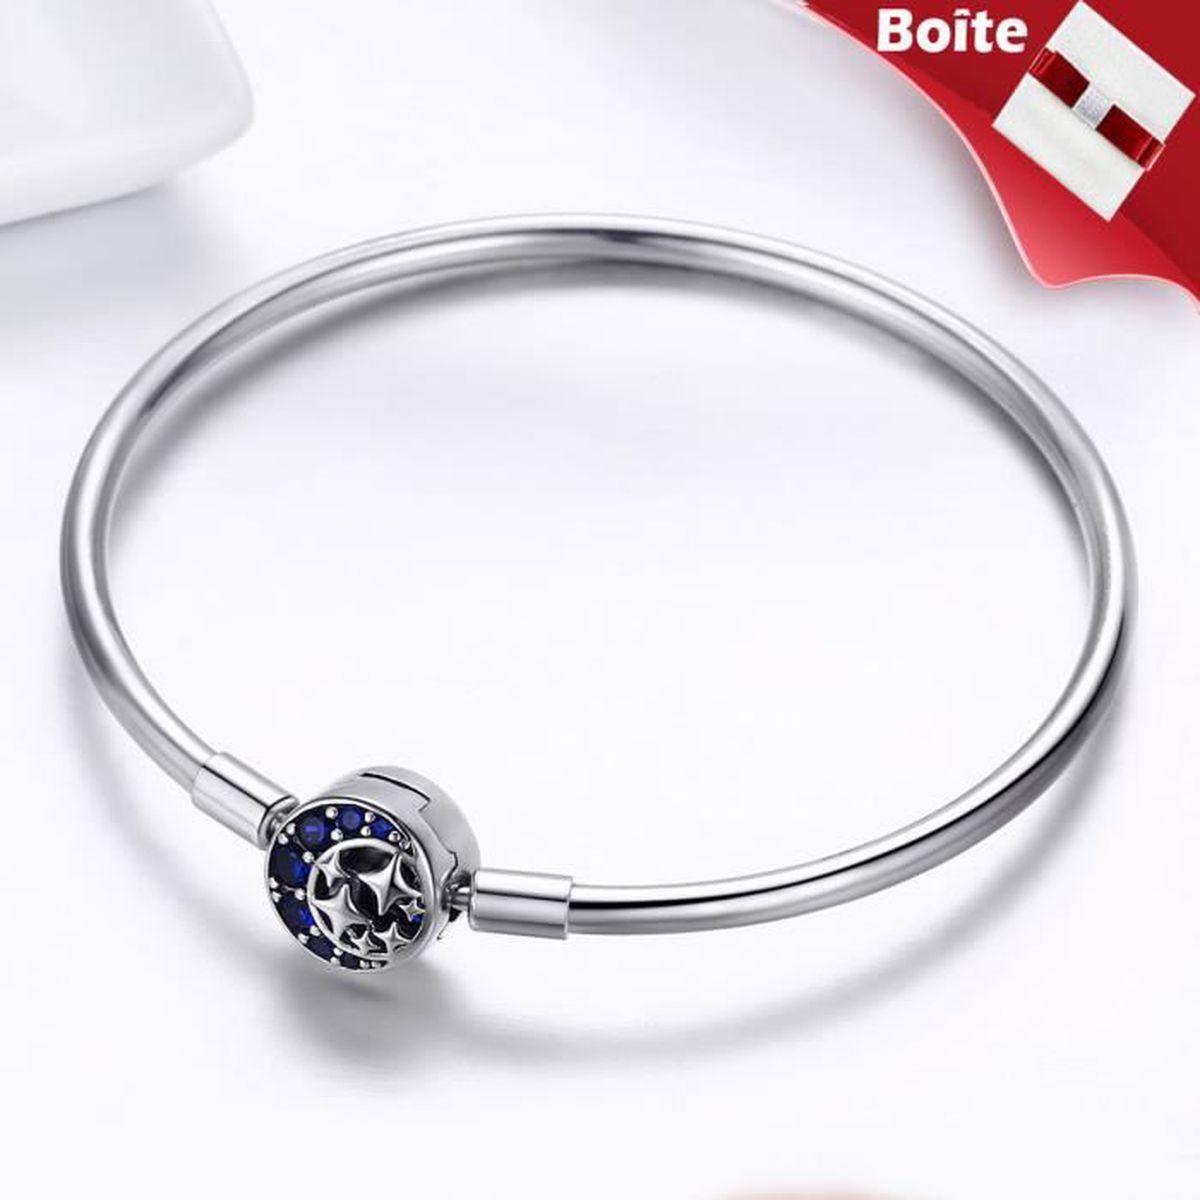 bracelet pandora 19 cm fermeture etoile